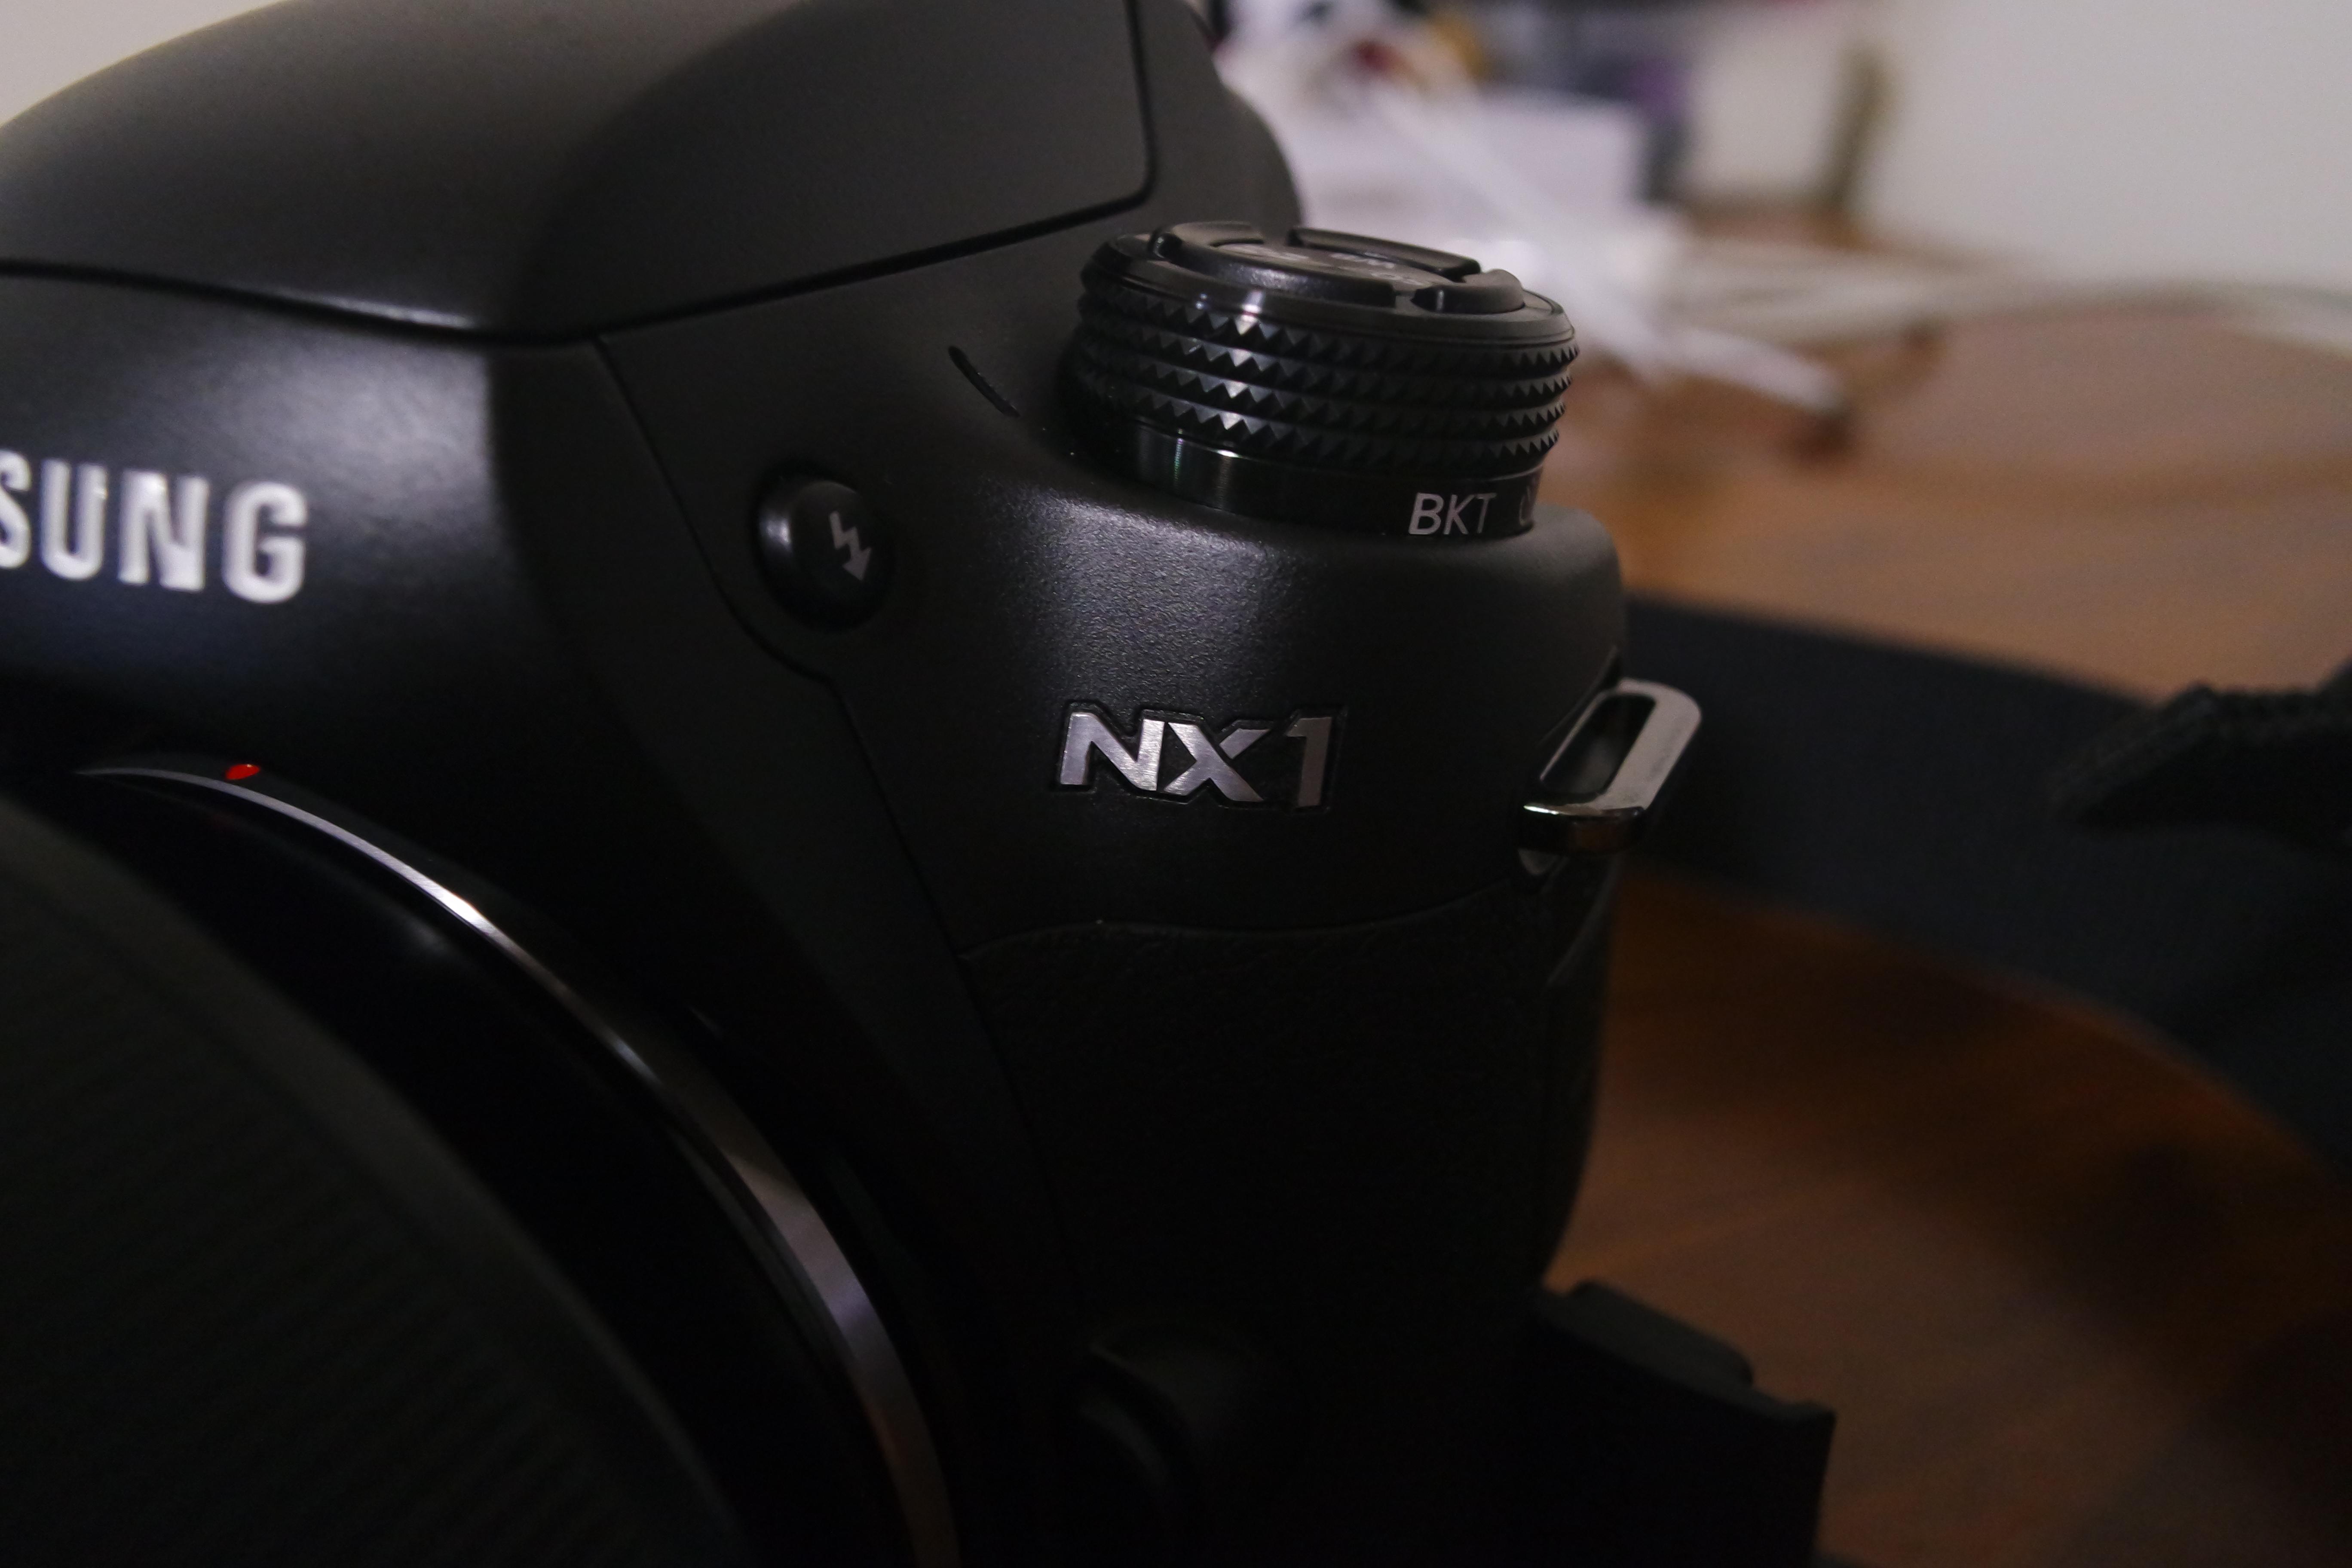 NX1 Badge